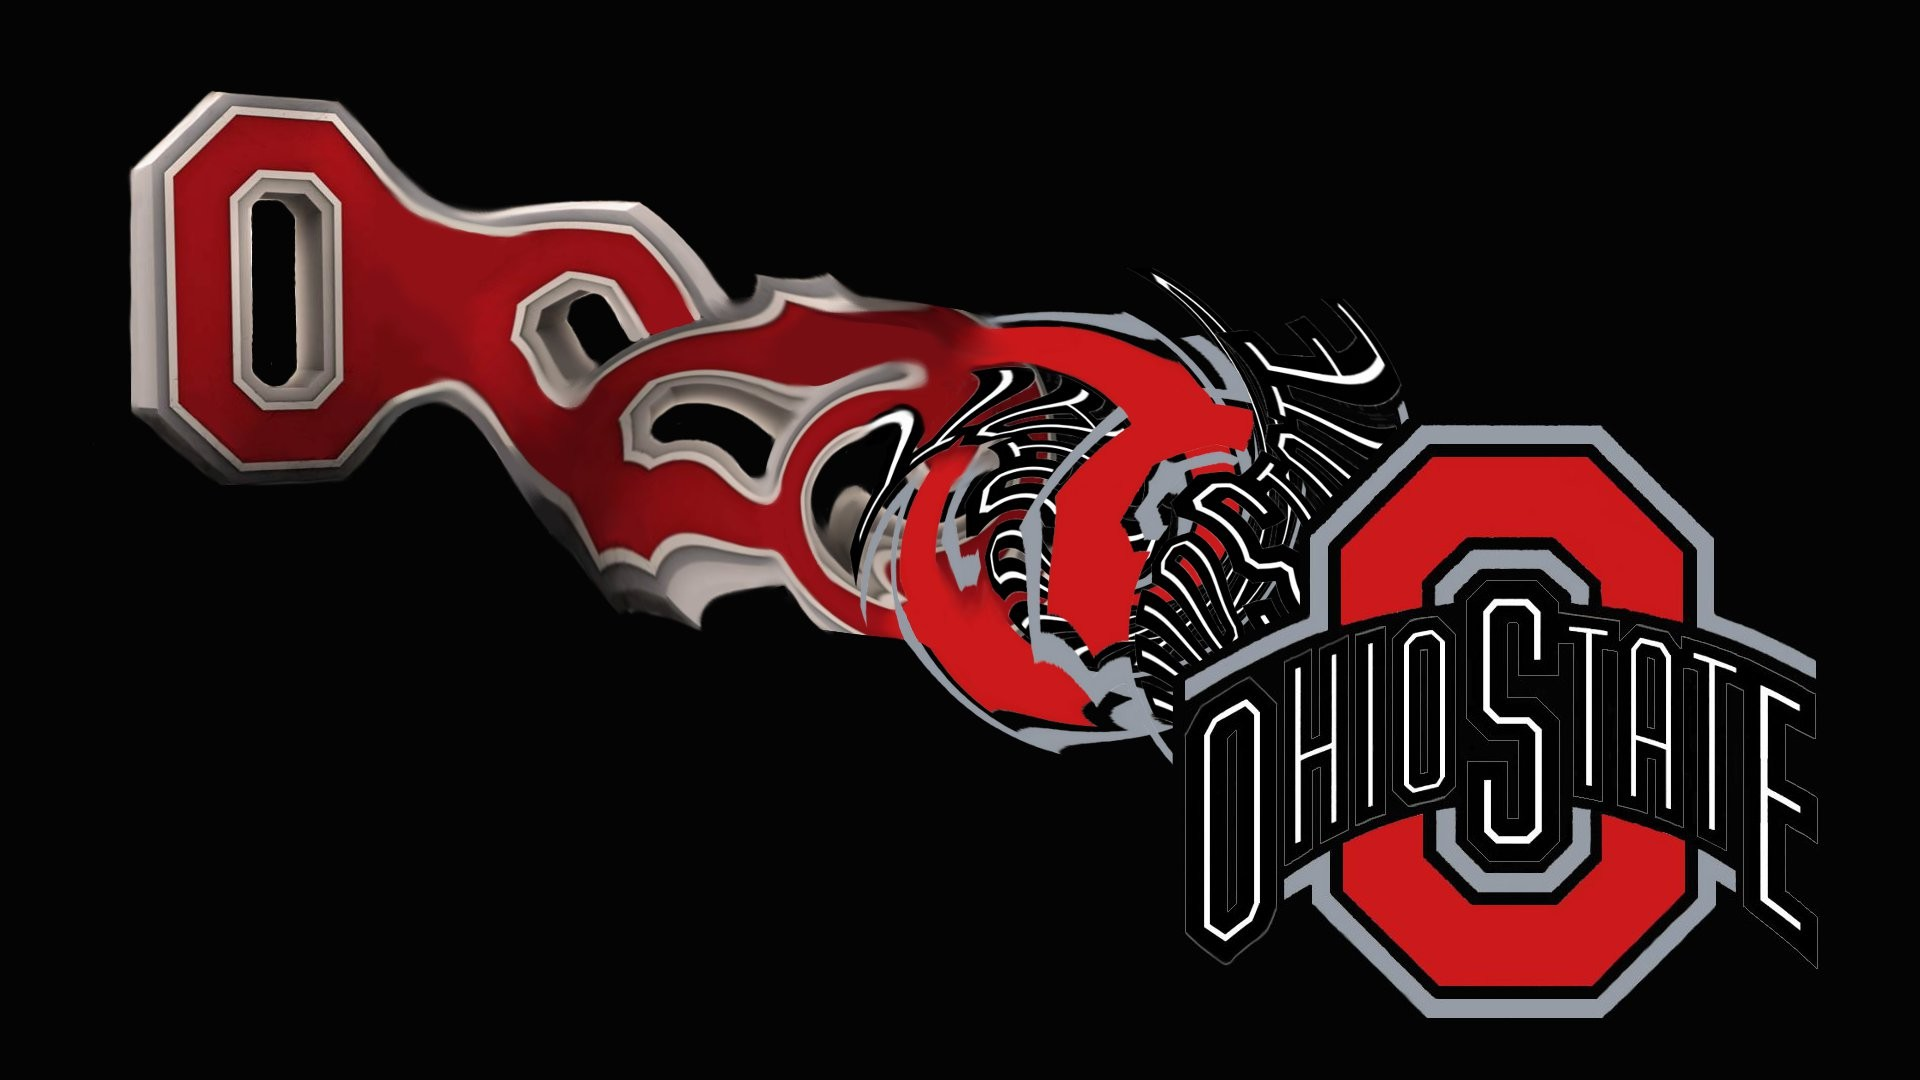 Ohio State Logo Wallpaper 3D.